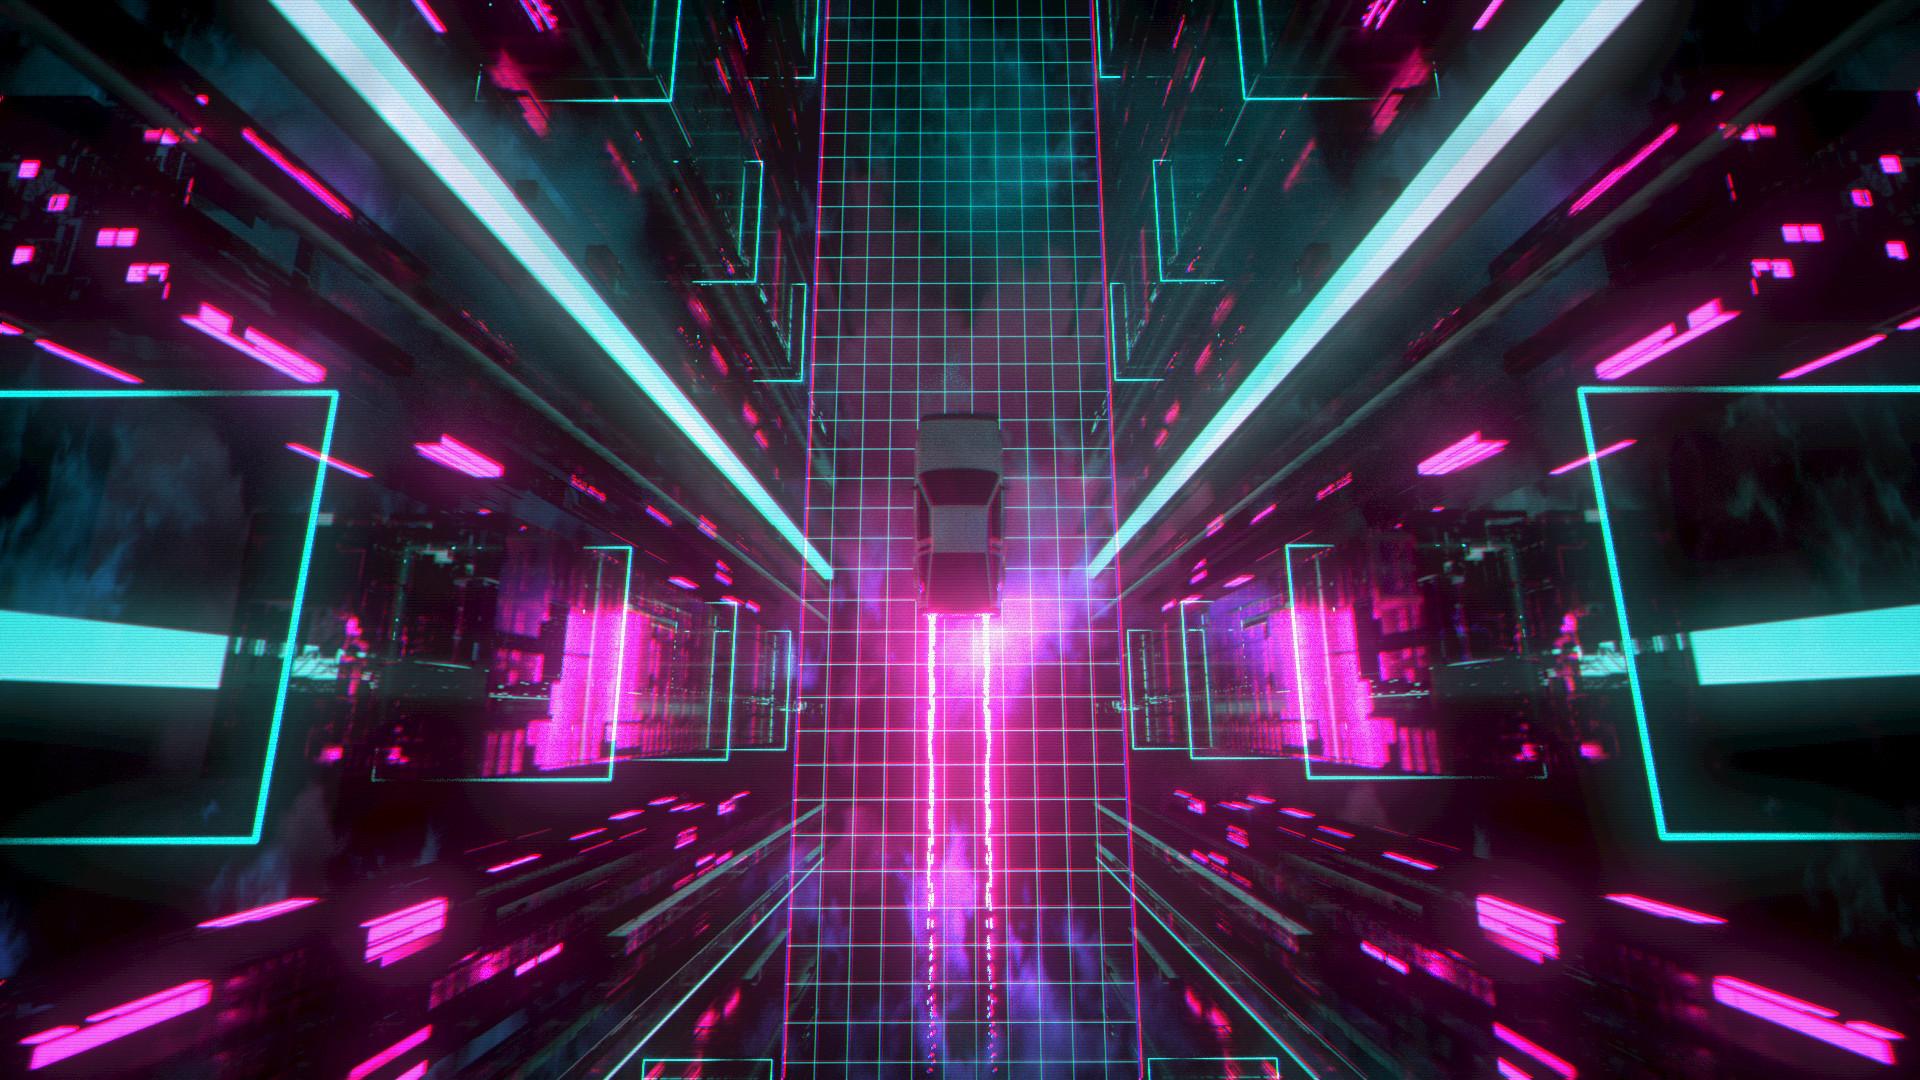 General 1920x1080 David Legnon cyberpunk car traces neon glow neon grid Retrowave pink glowing blue digital art